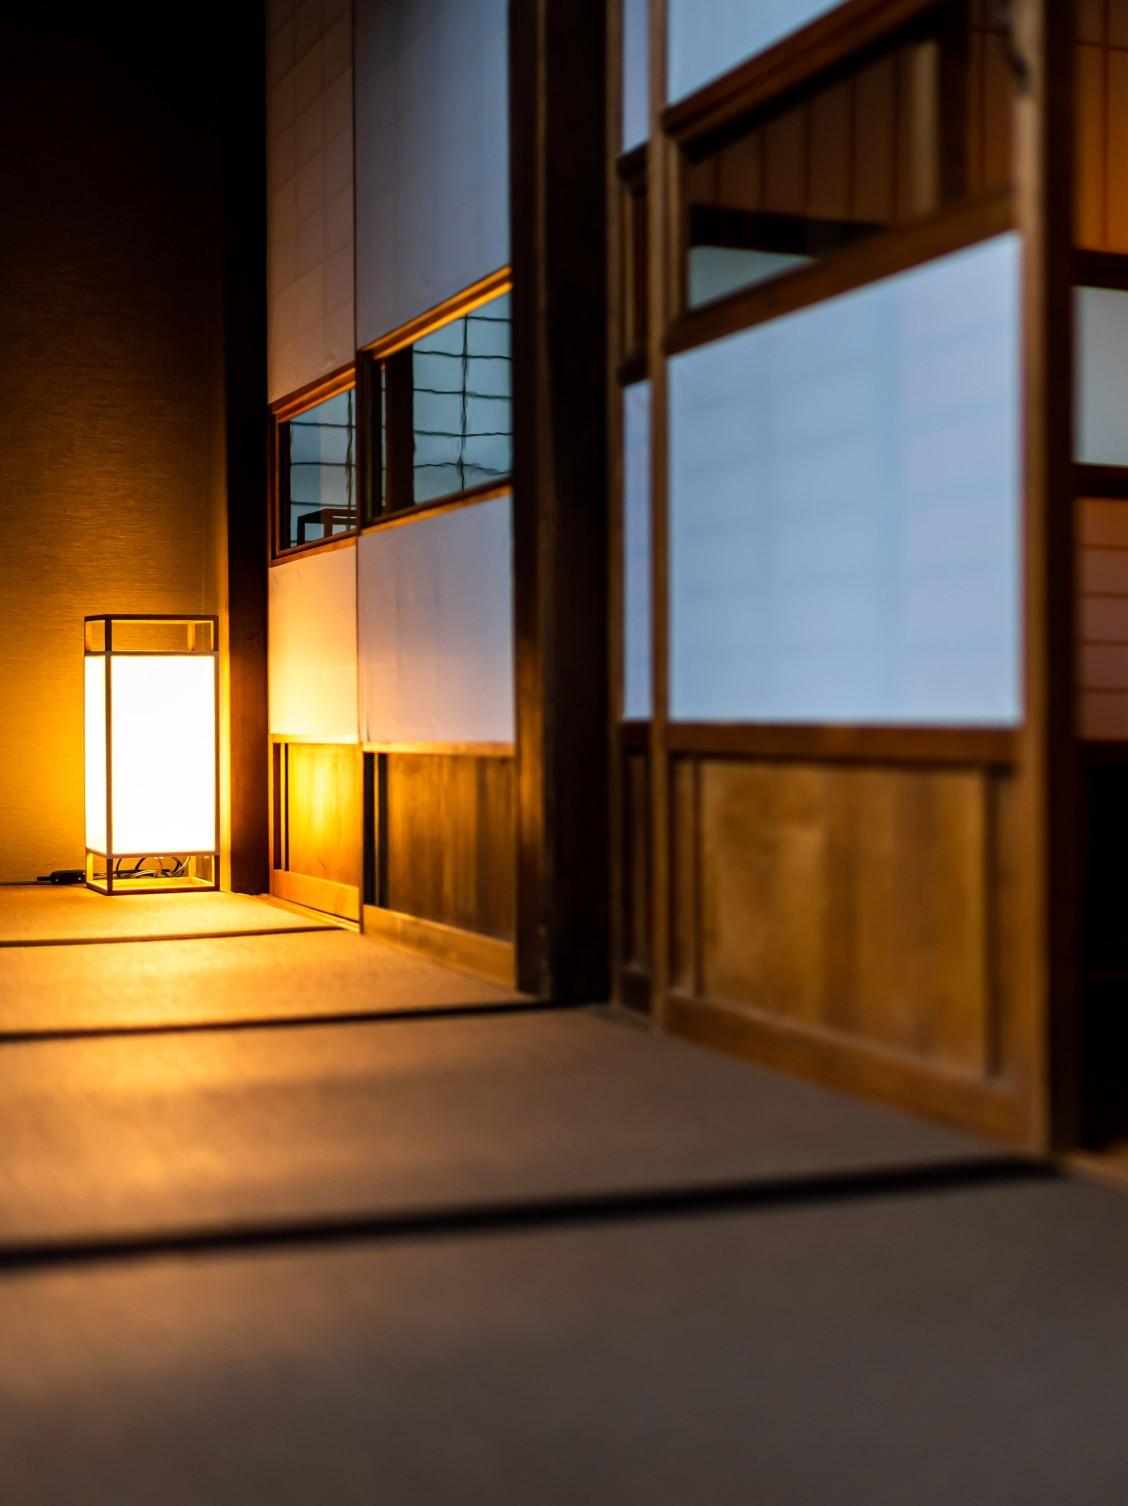 Explore ryokan retreats